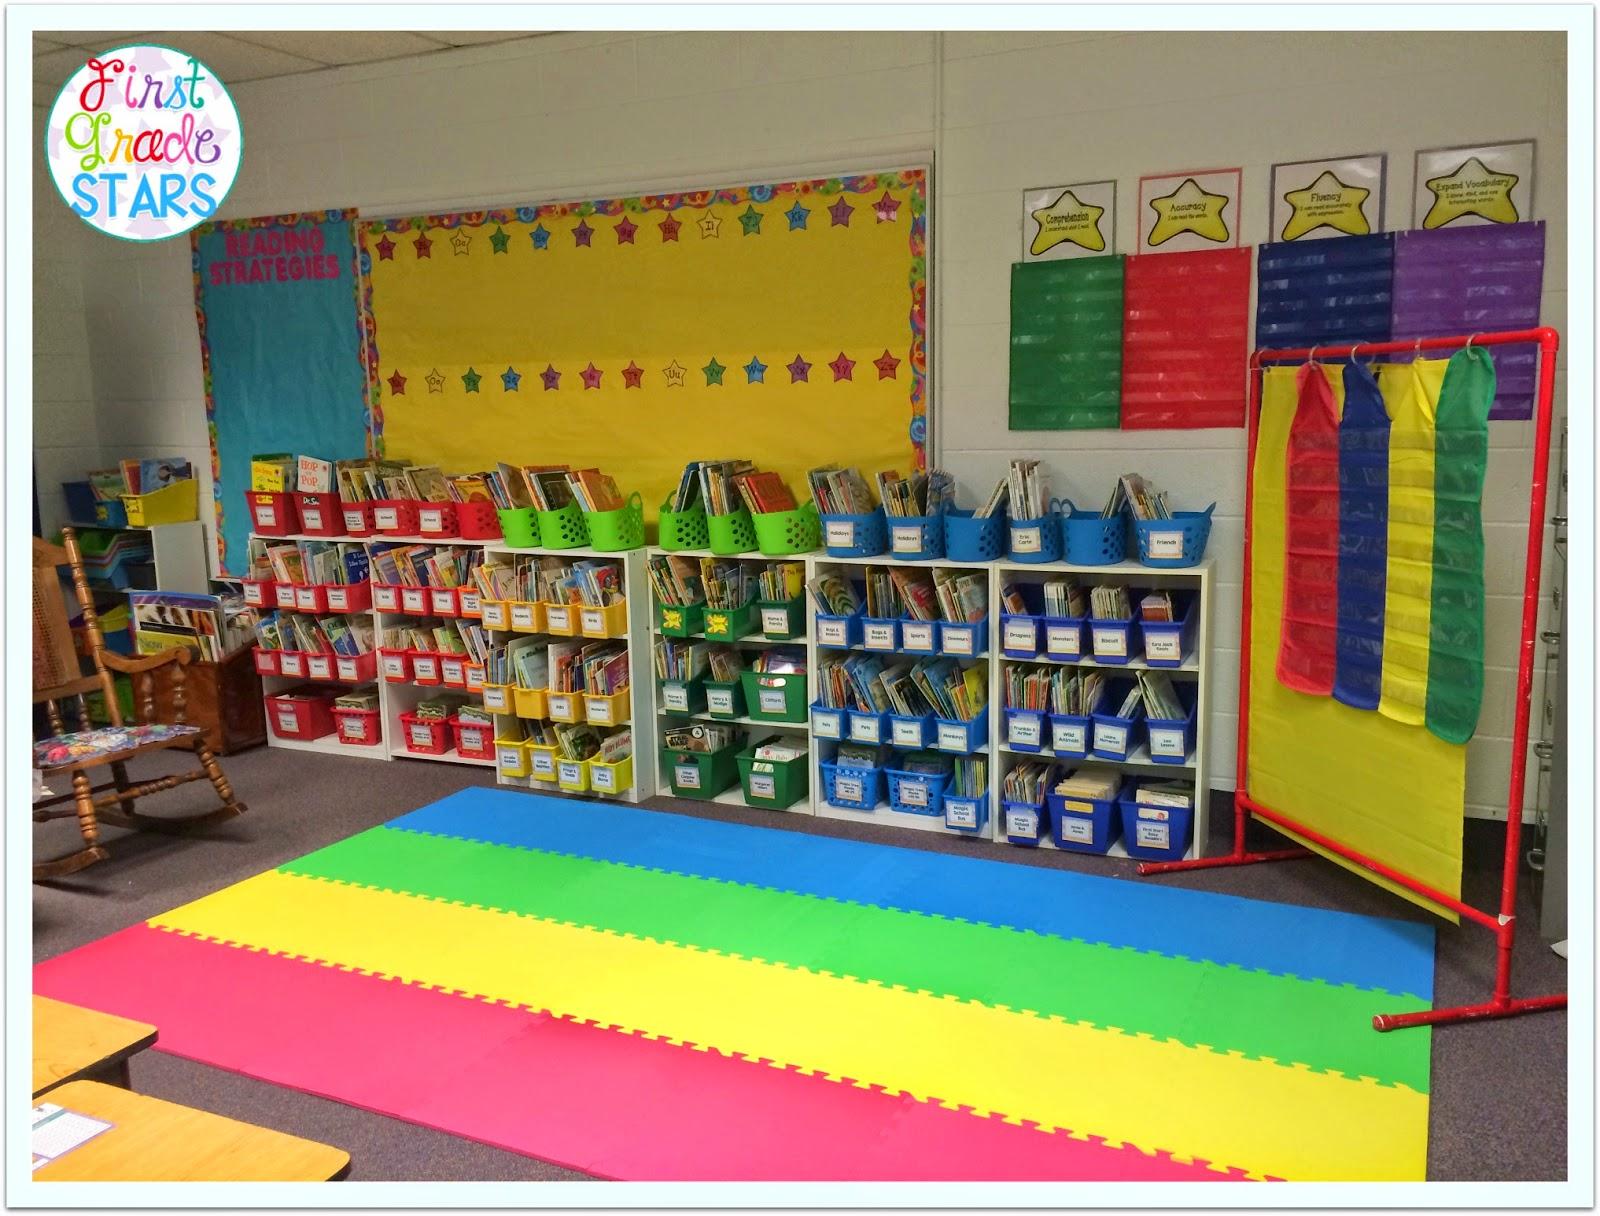 Classroom Setup Ideas For First Grade ~ First grade stars worksheets don t grow dendrites book